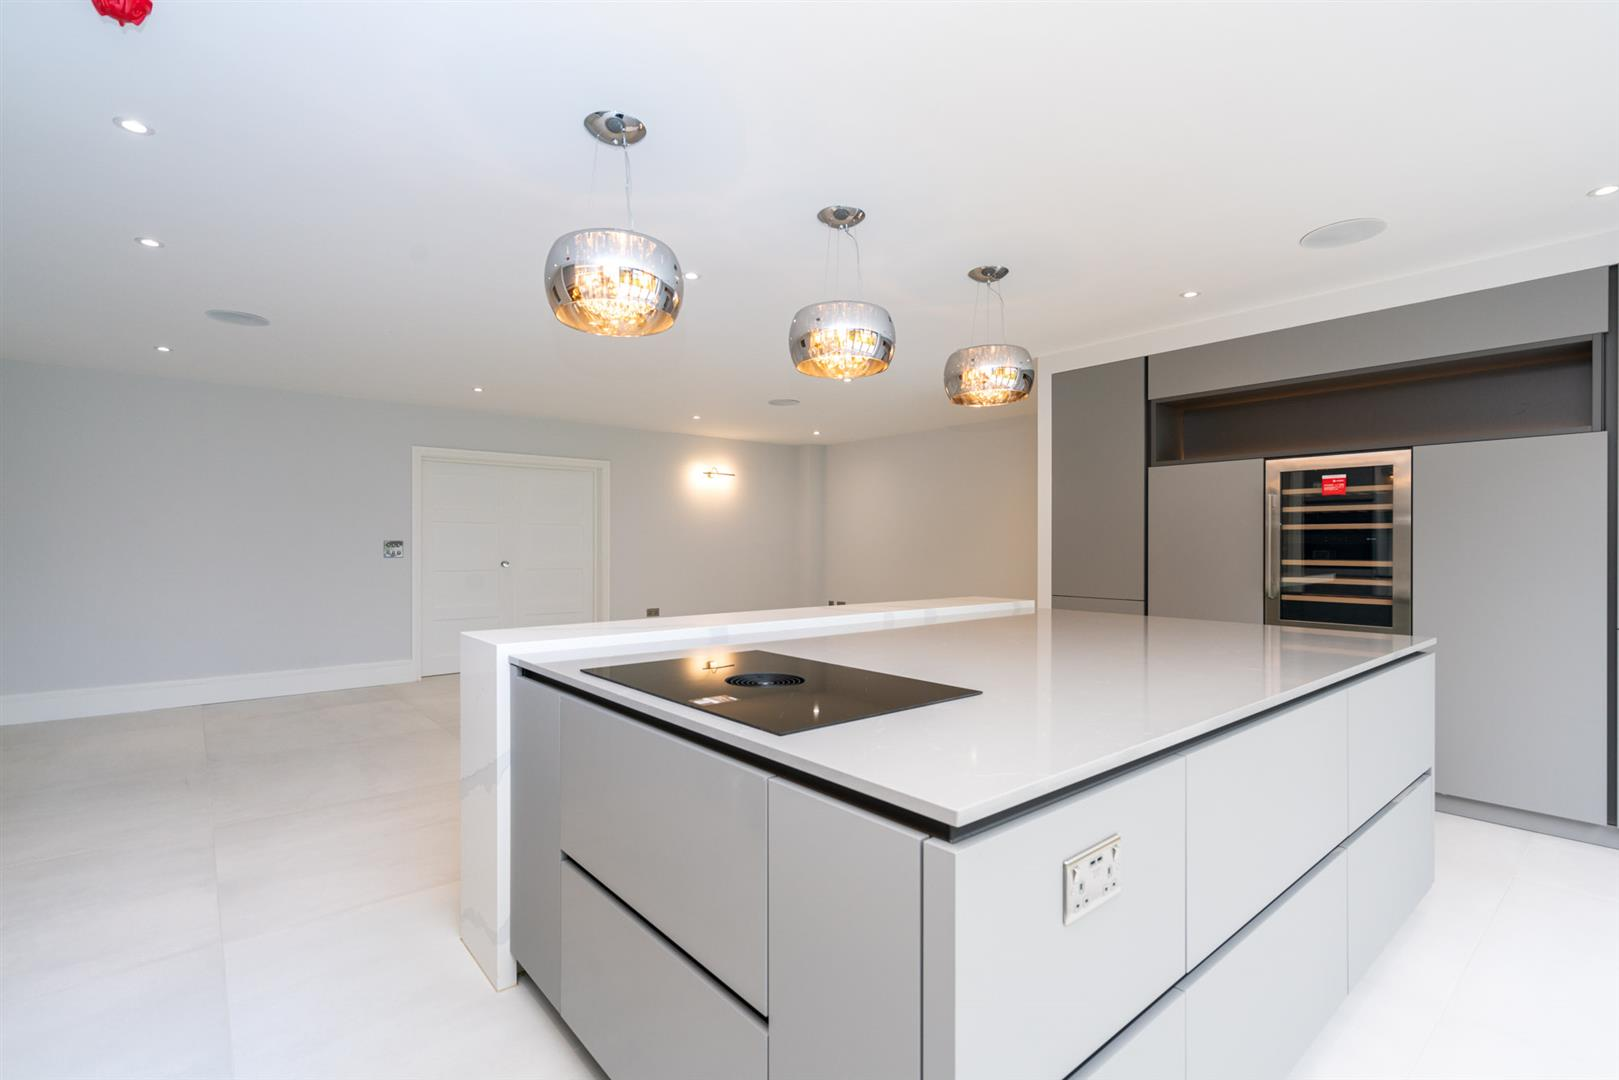 Bramley-3278 - kitchen 2.jpg